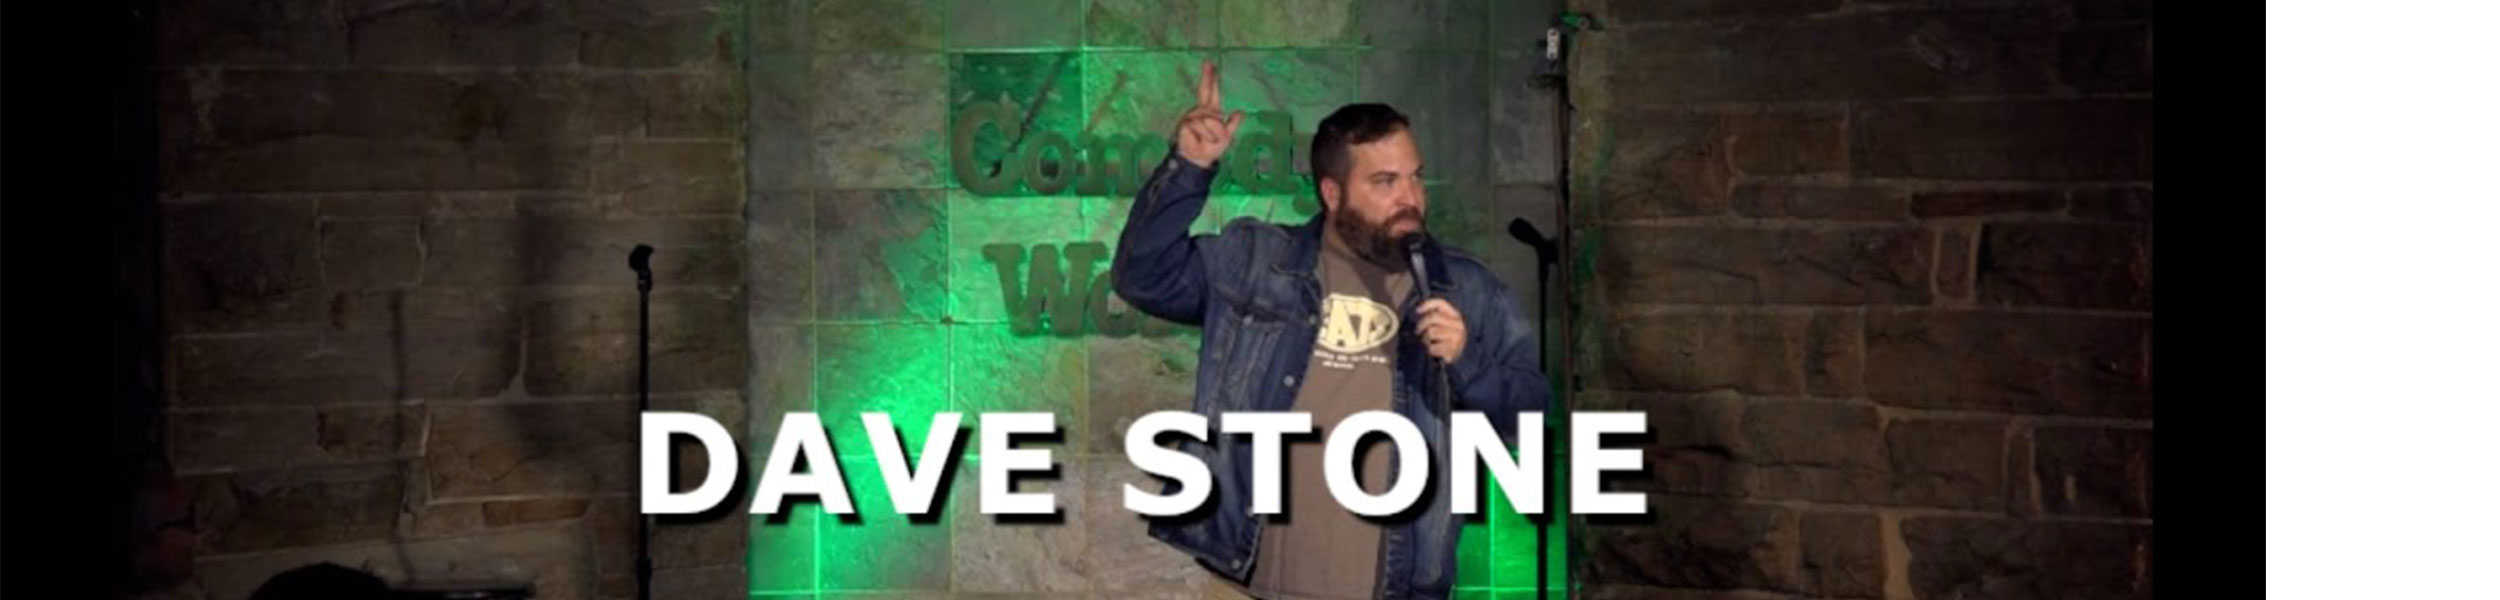 Dave Stone Headlines the Club